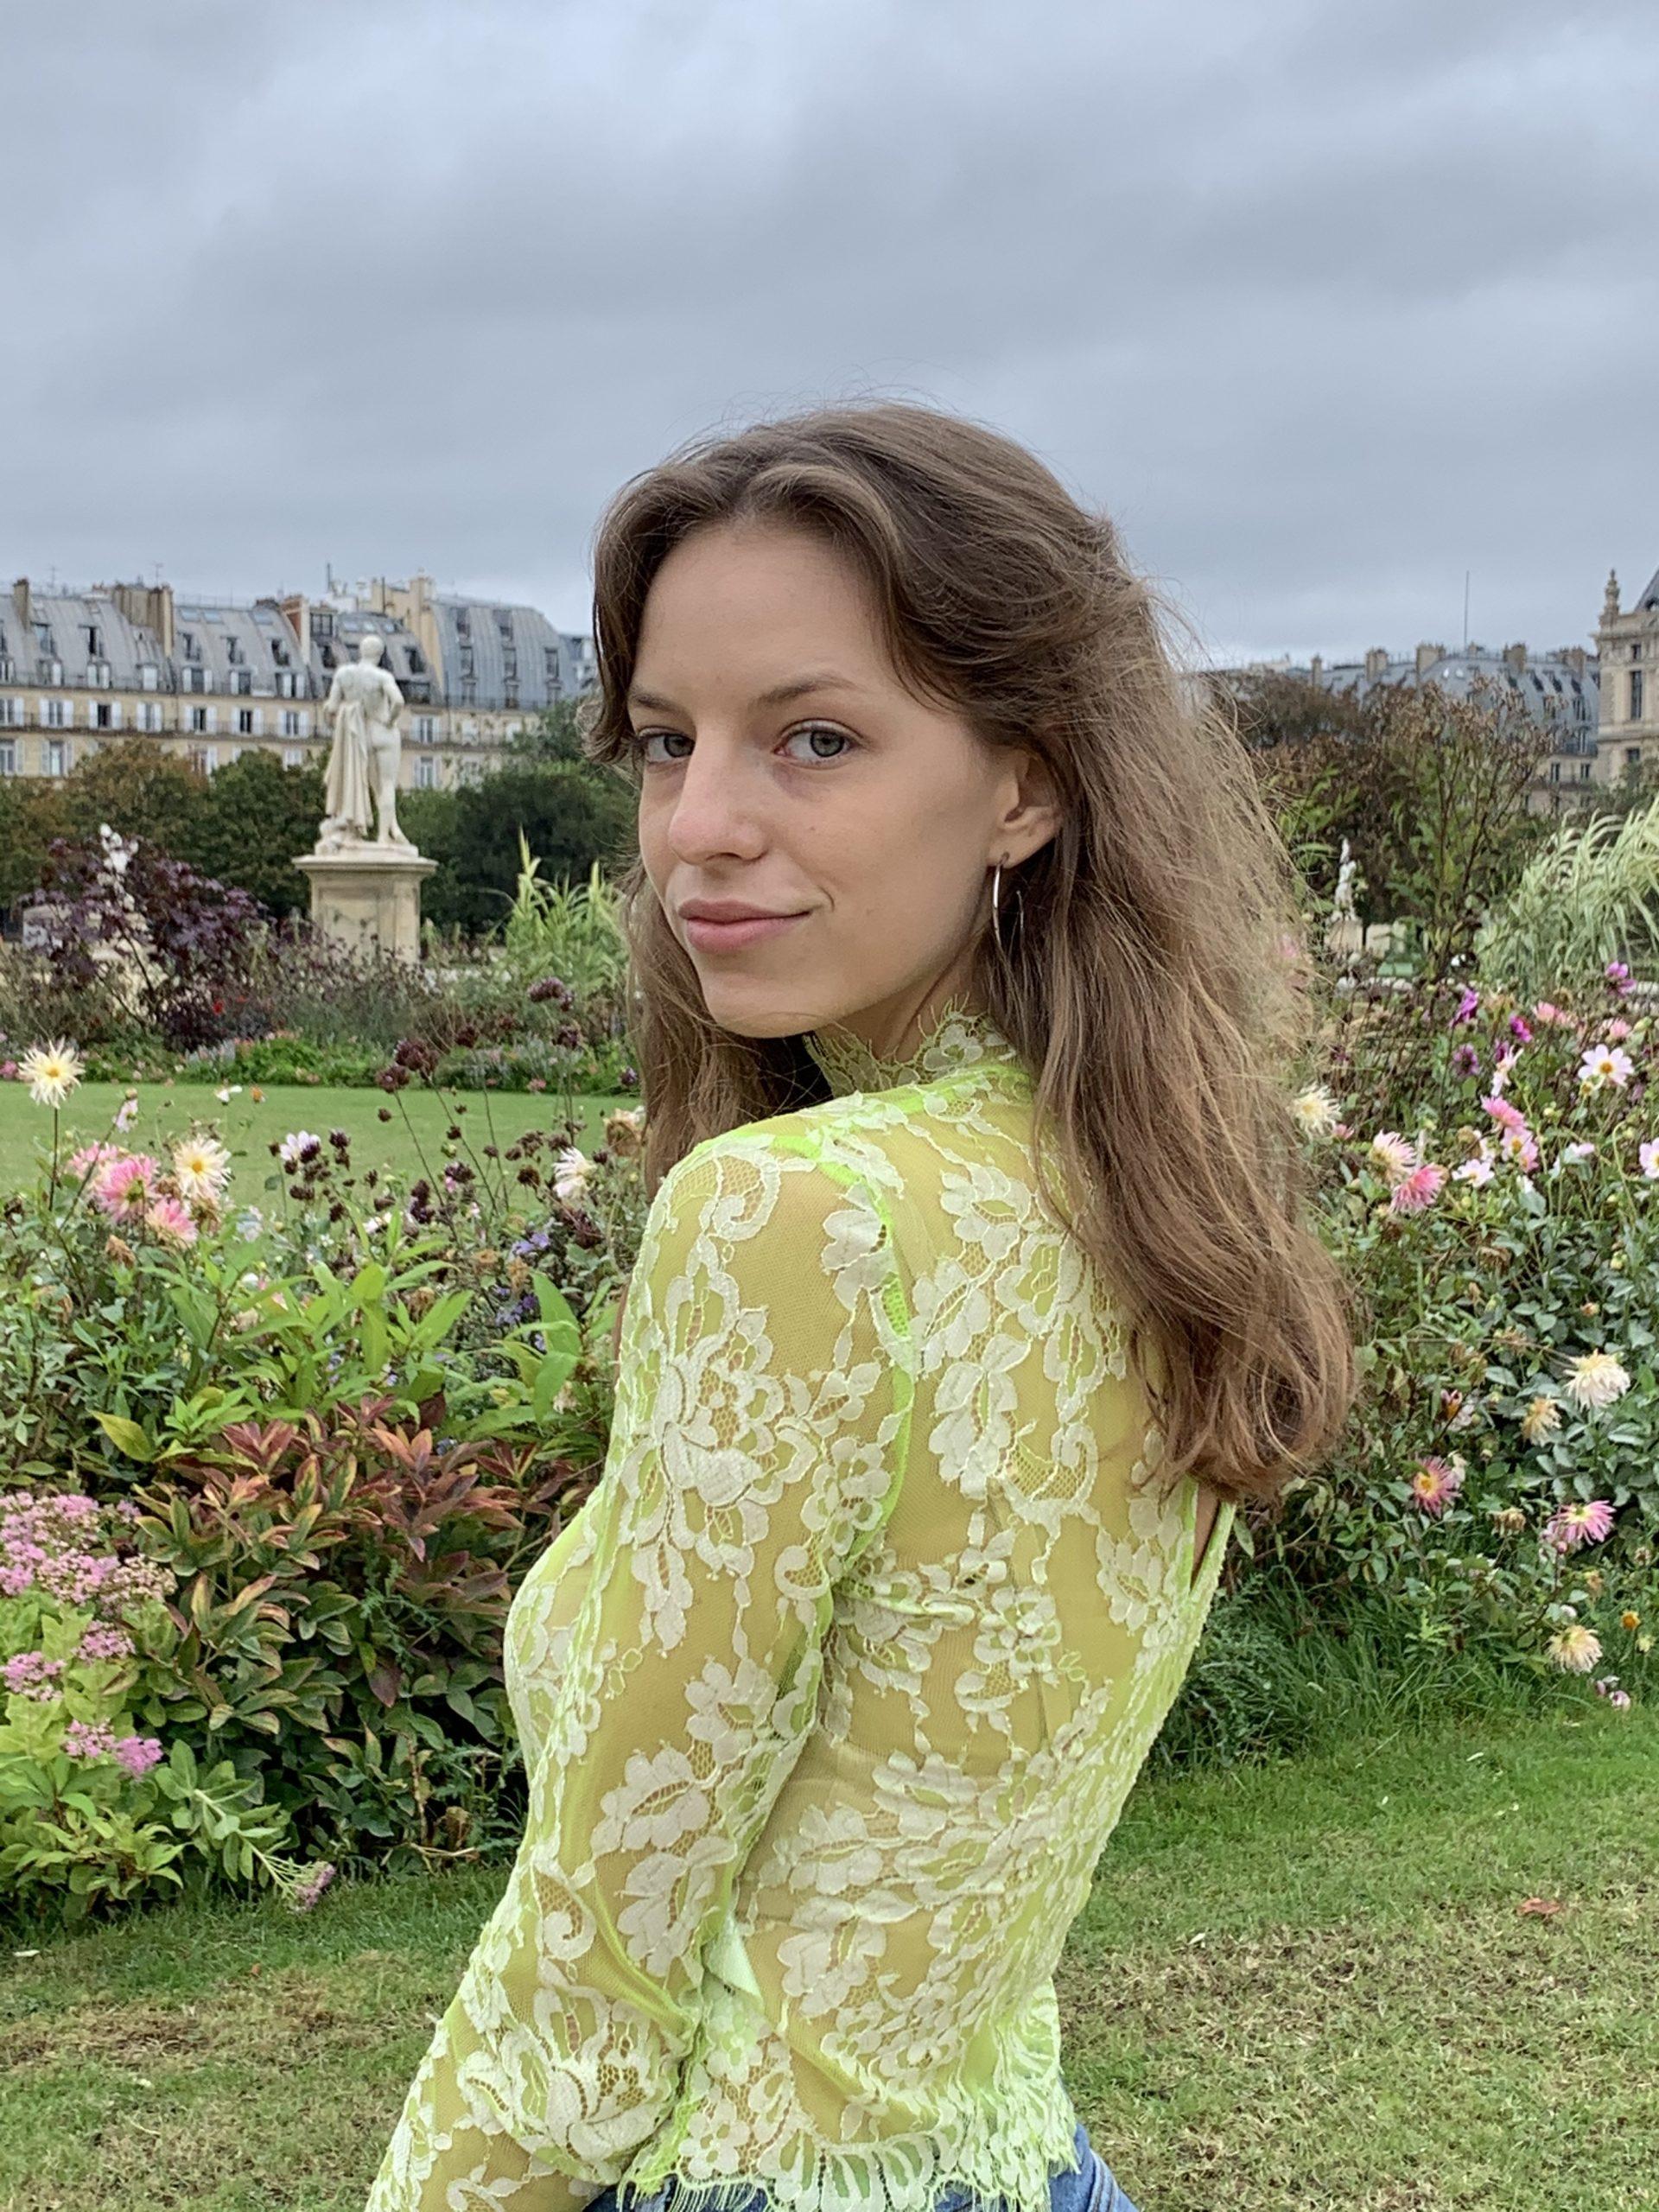 Lilli-Marie Enders